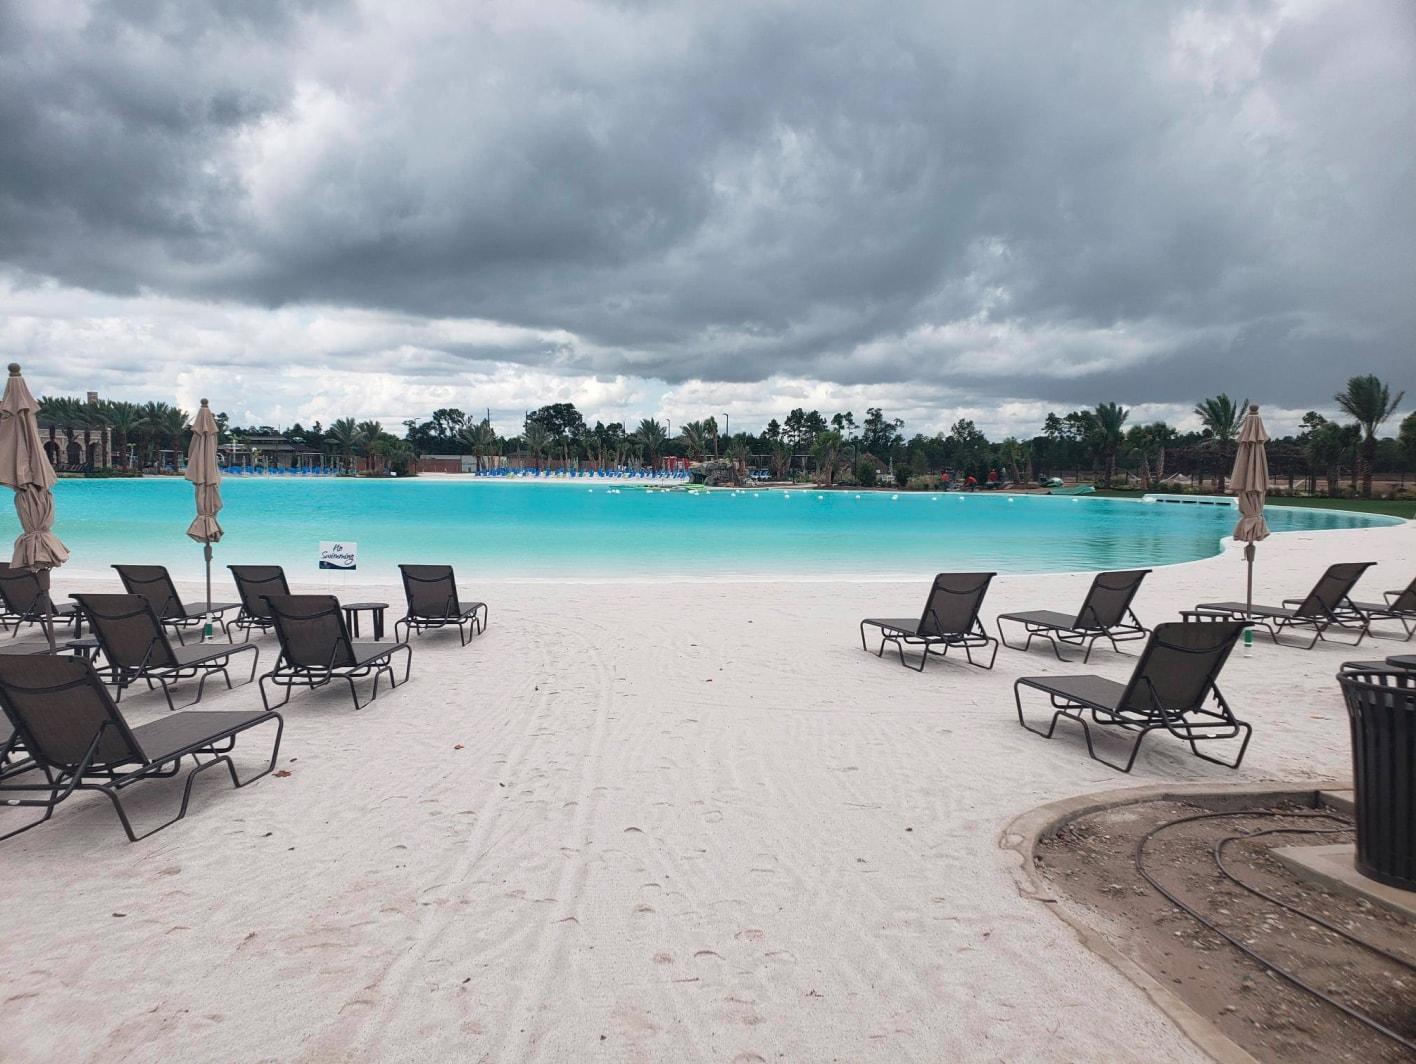 crystal lagoon beach in texas